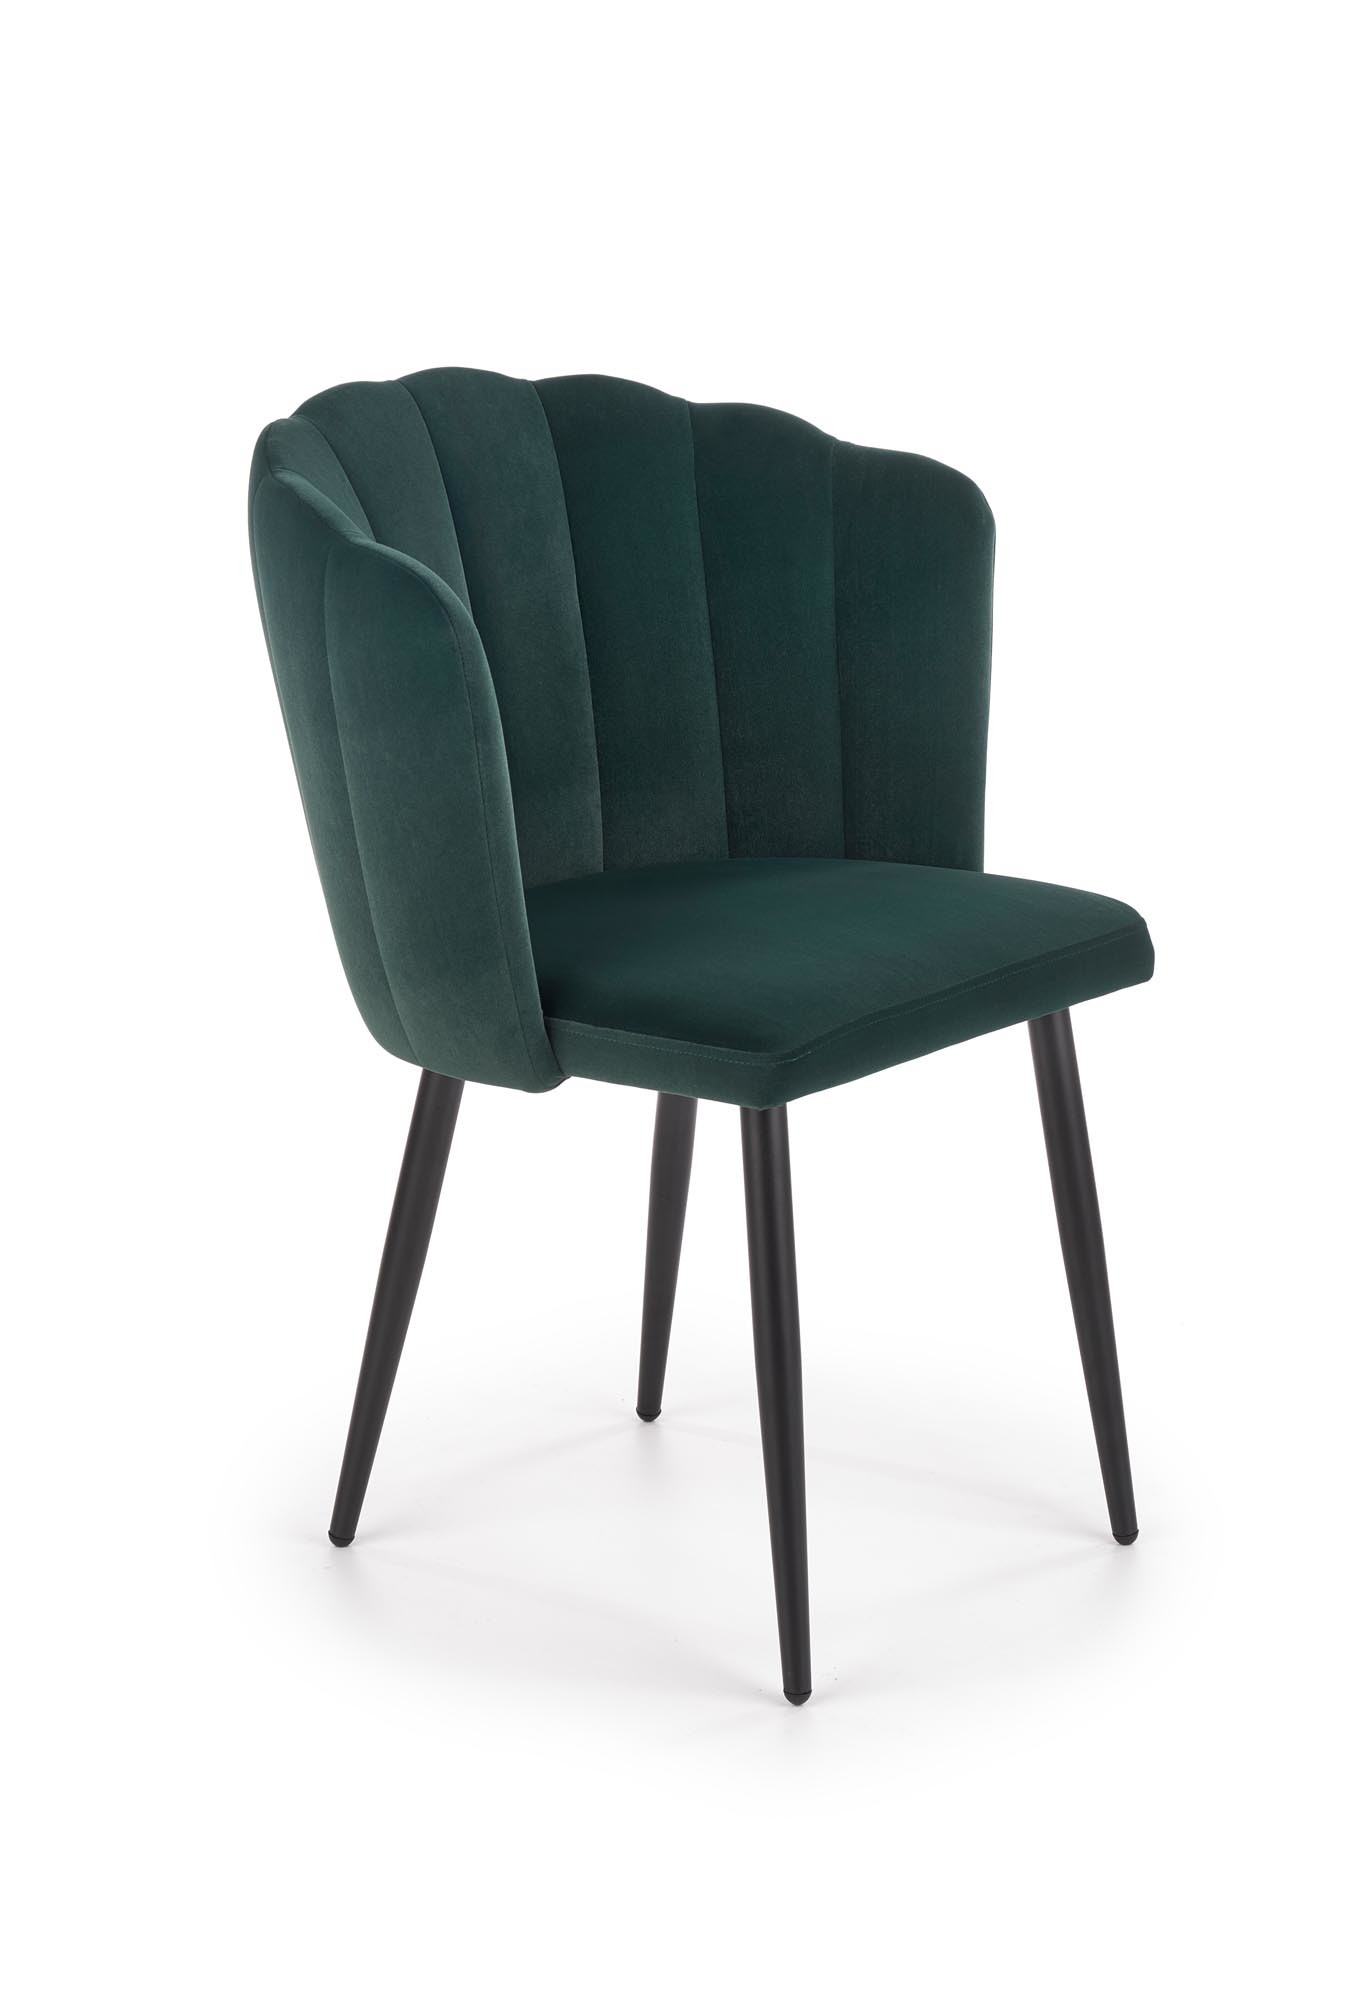 Samt Sessel-Stuhl Embos 03